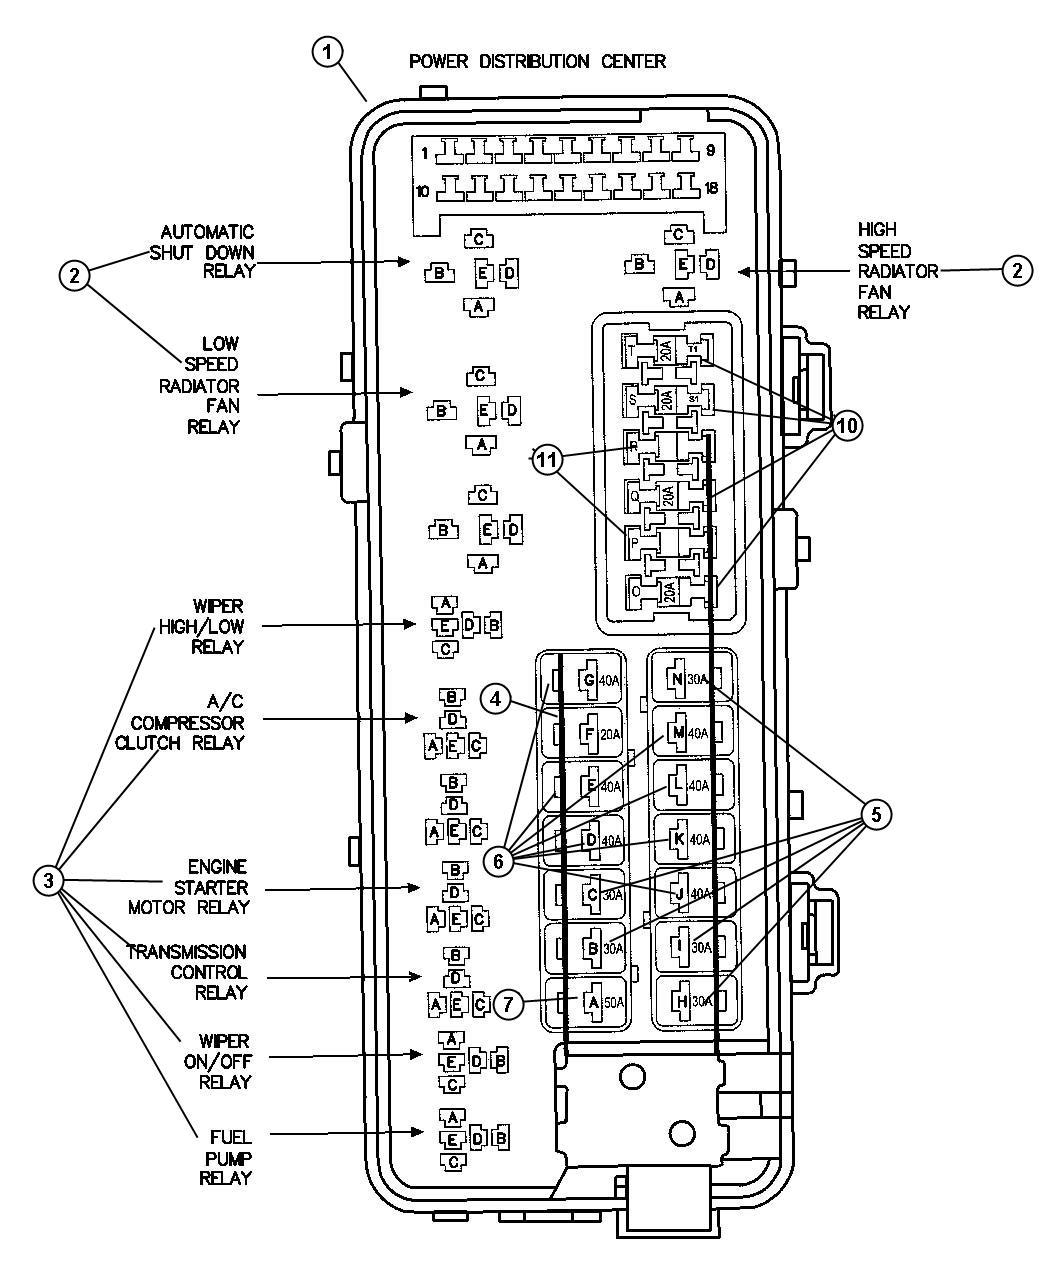 2003 Chrysler Concorde Power Distribution Center